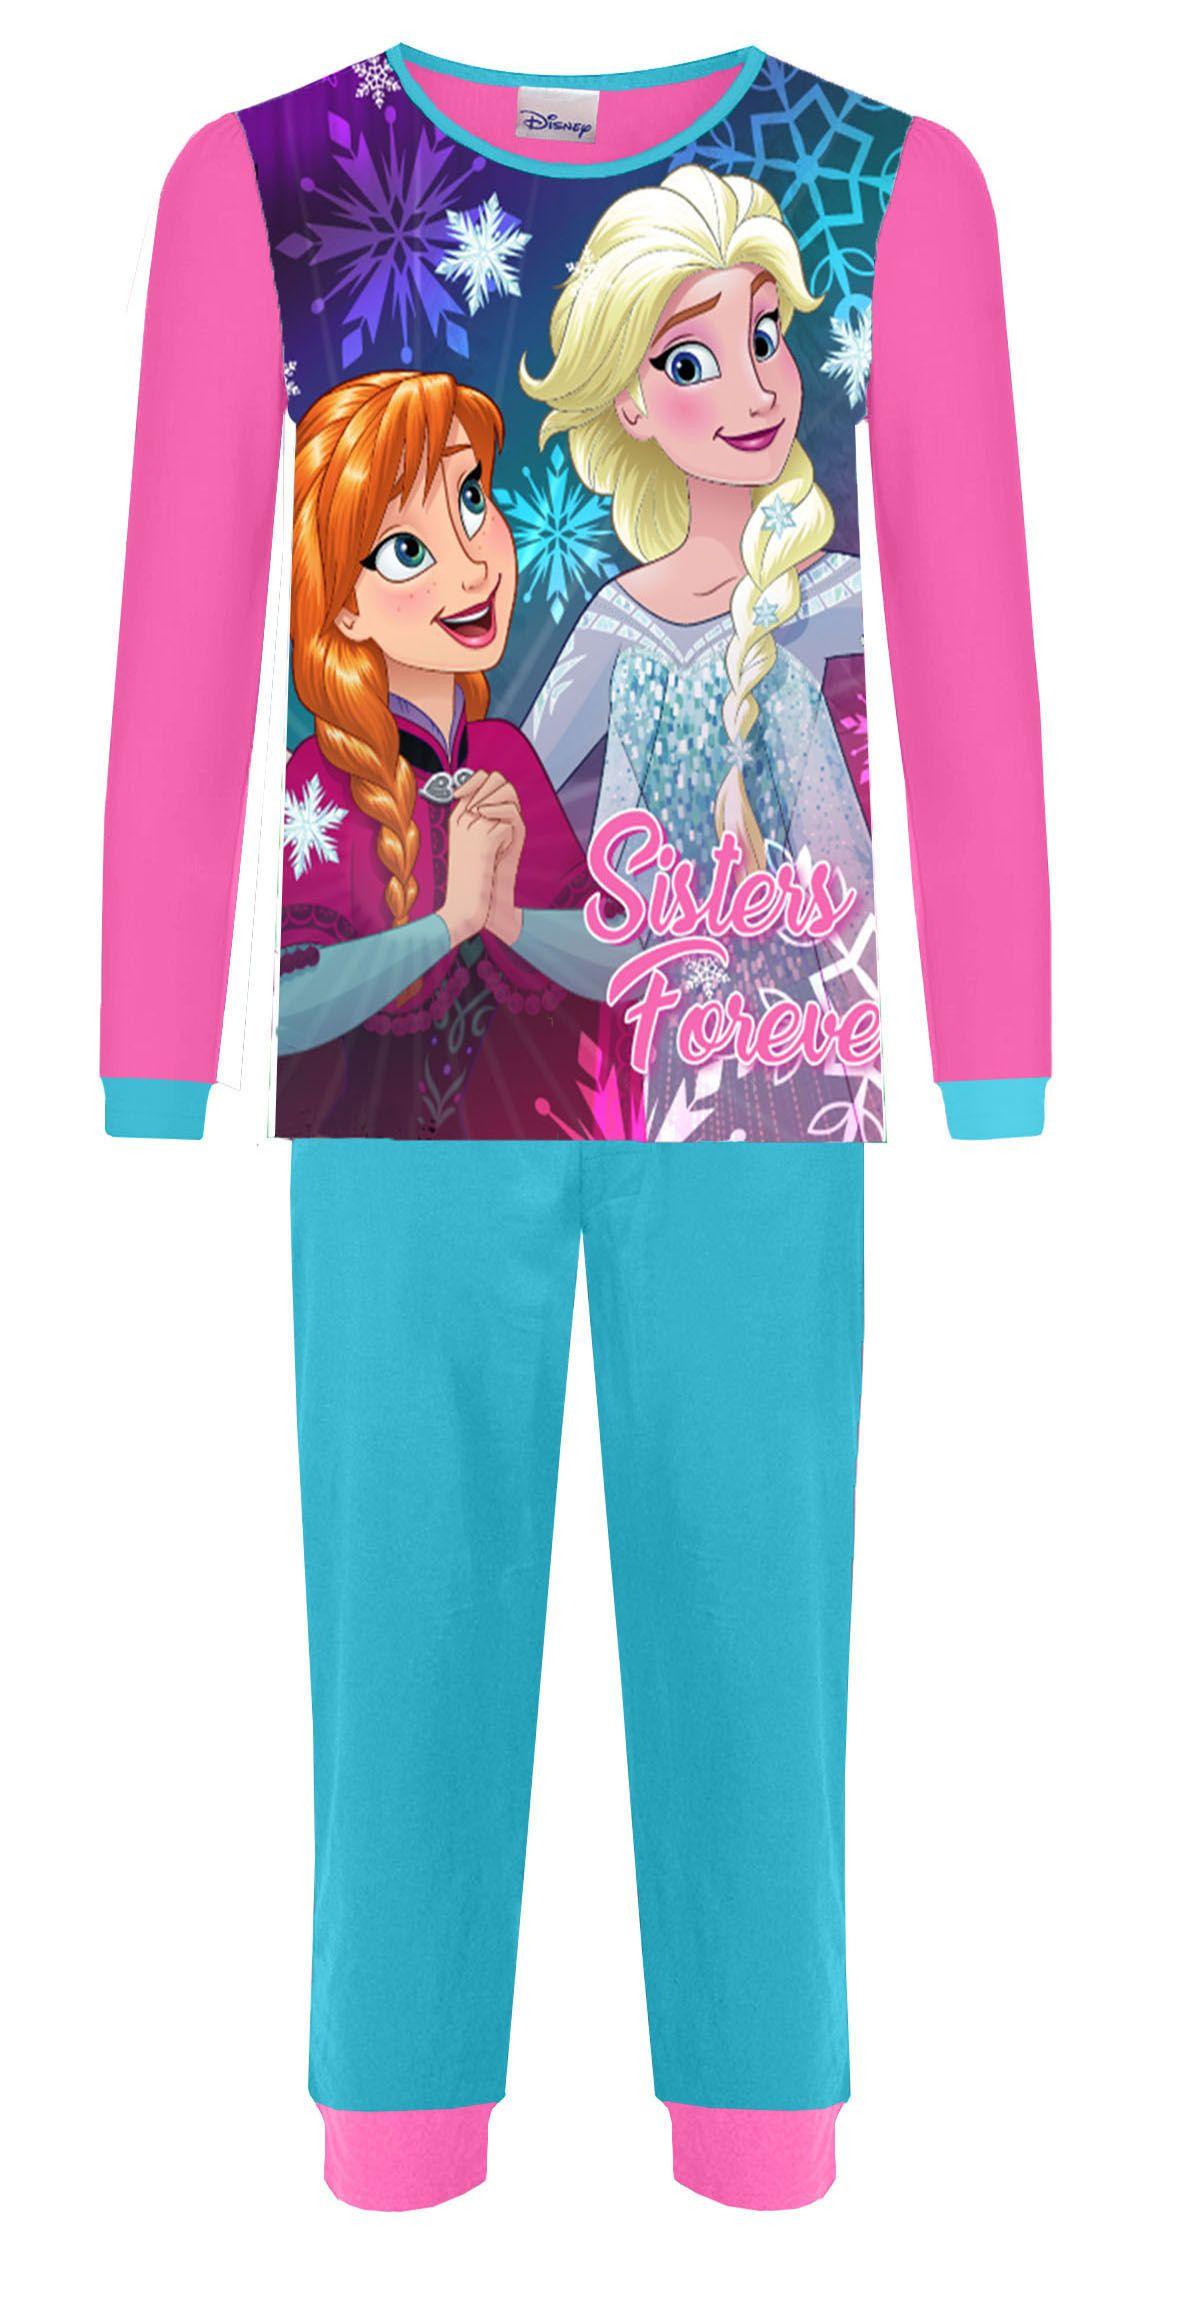 Official Disney Frozen Olaf Cotton Onesie Nightwear Pyjamas All In One Anna Elsa